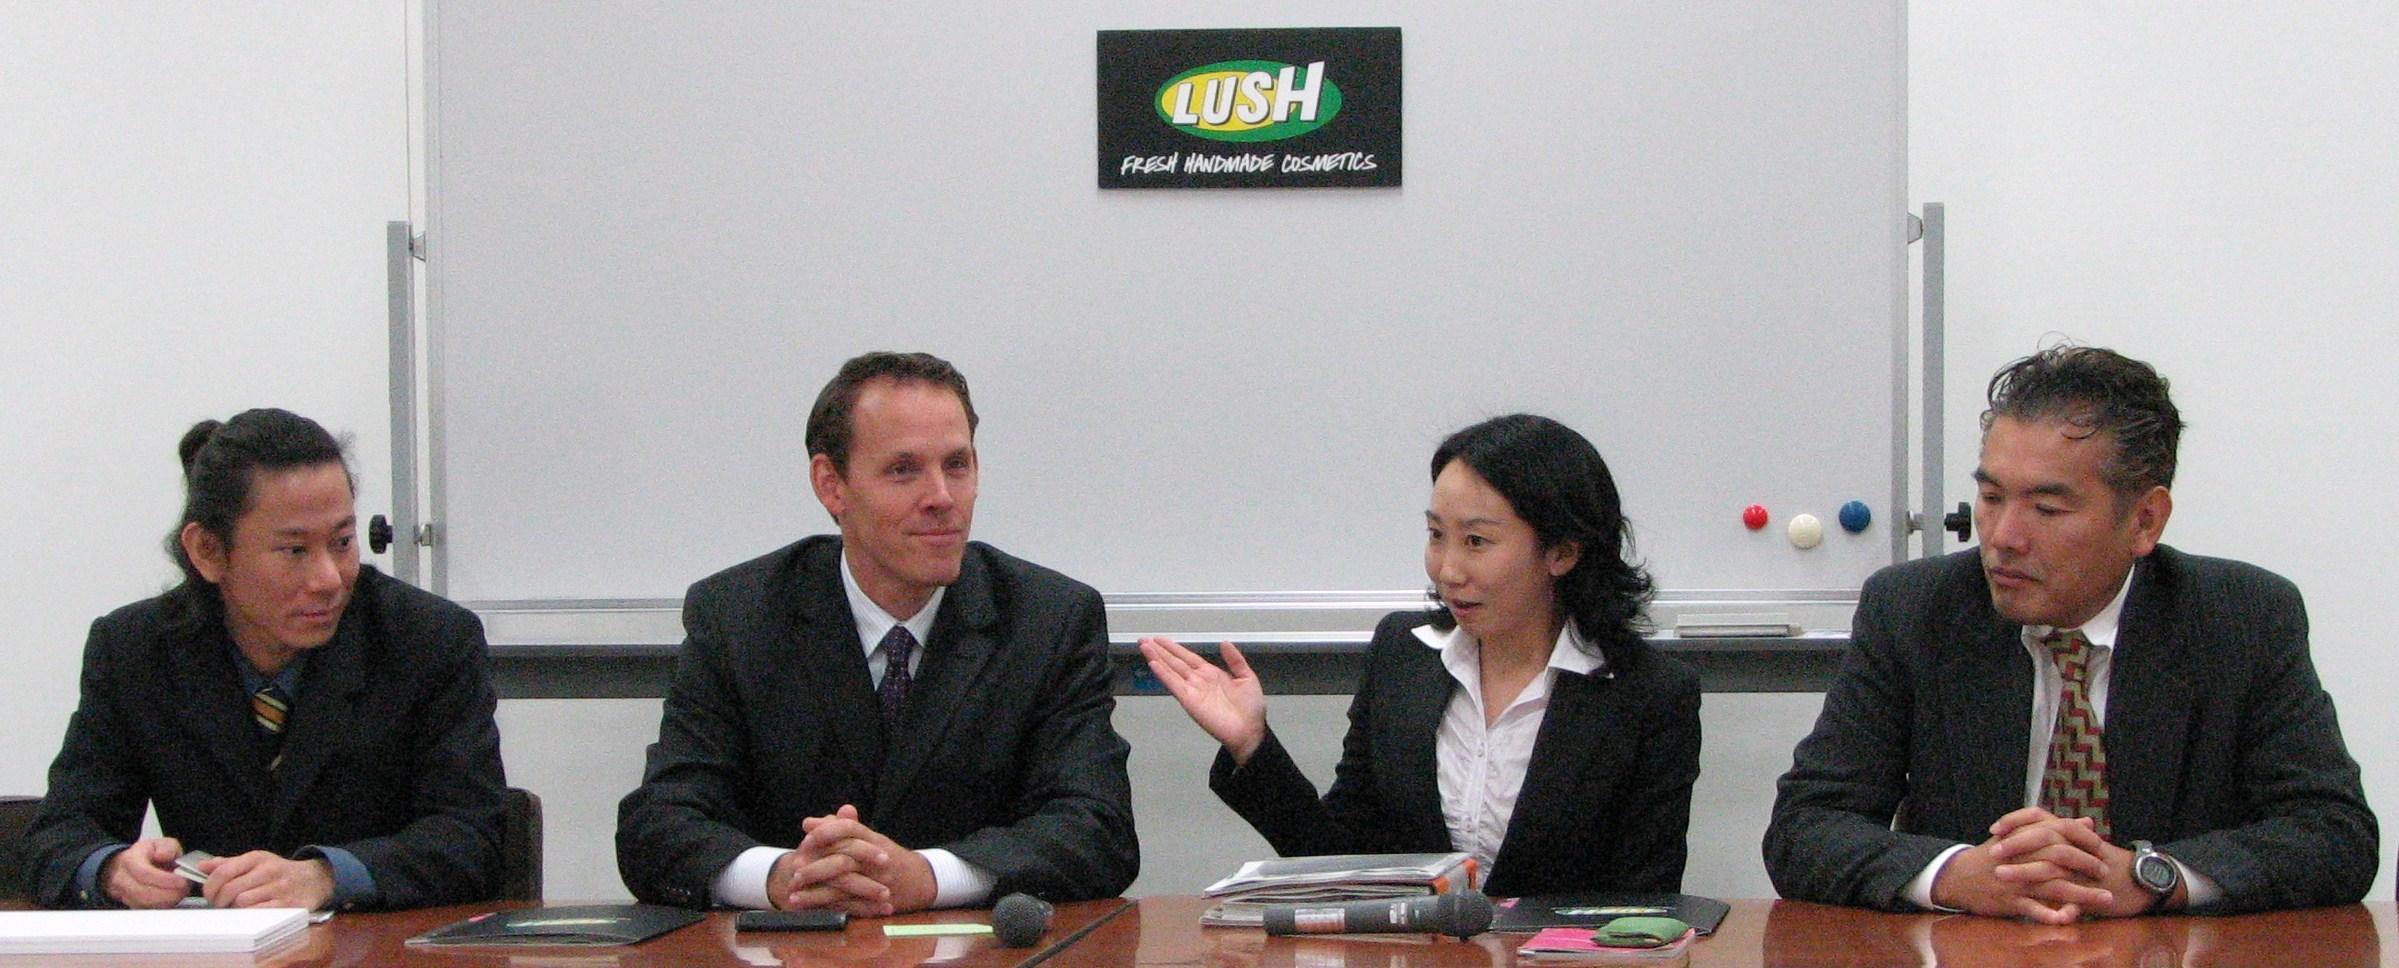 lush1202-0